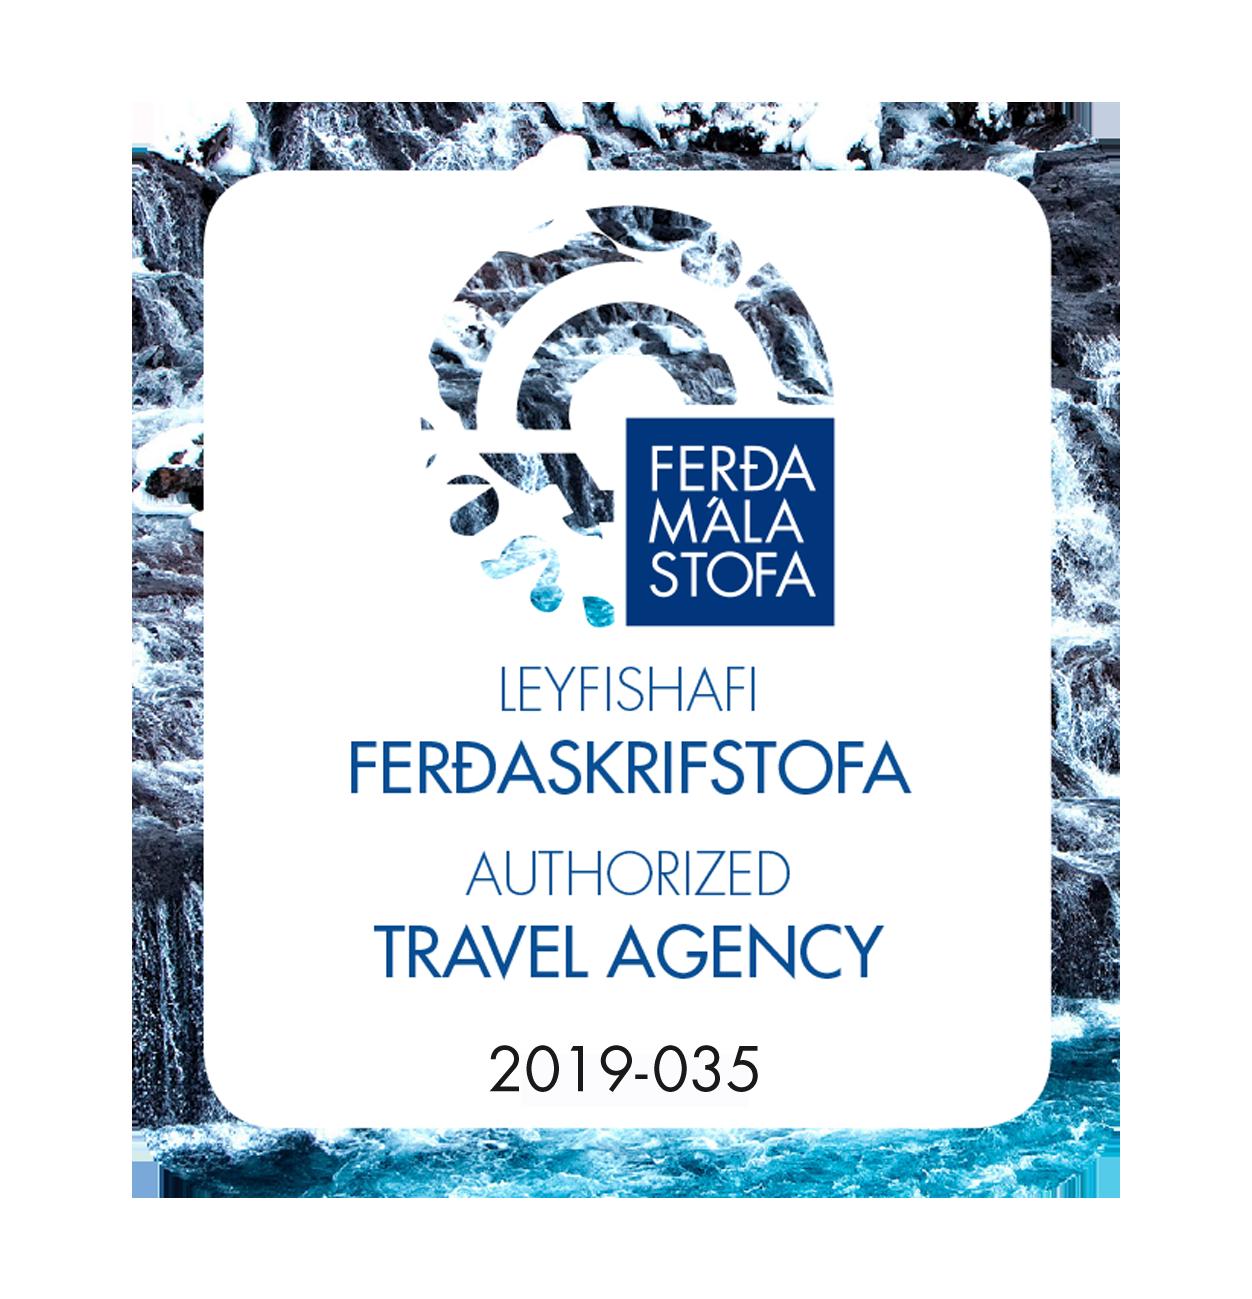 authorized-travel-agency-2019